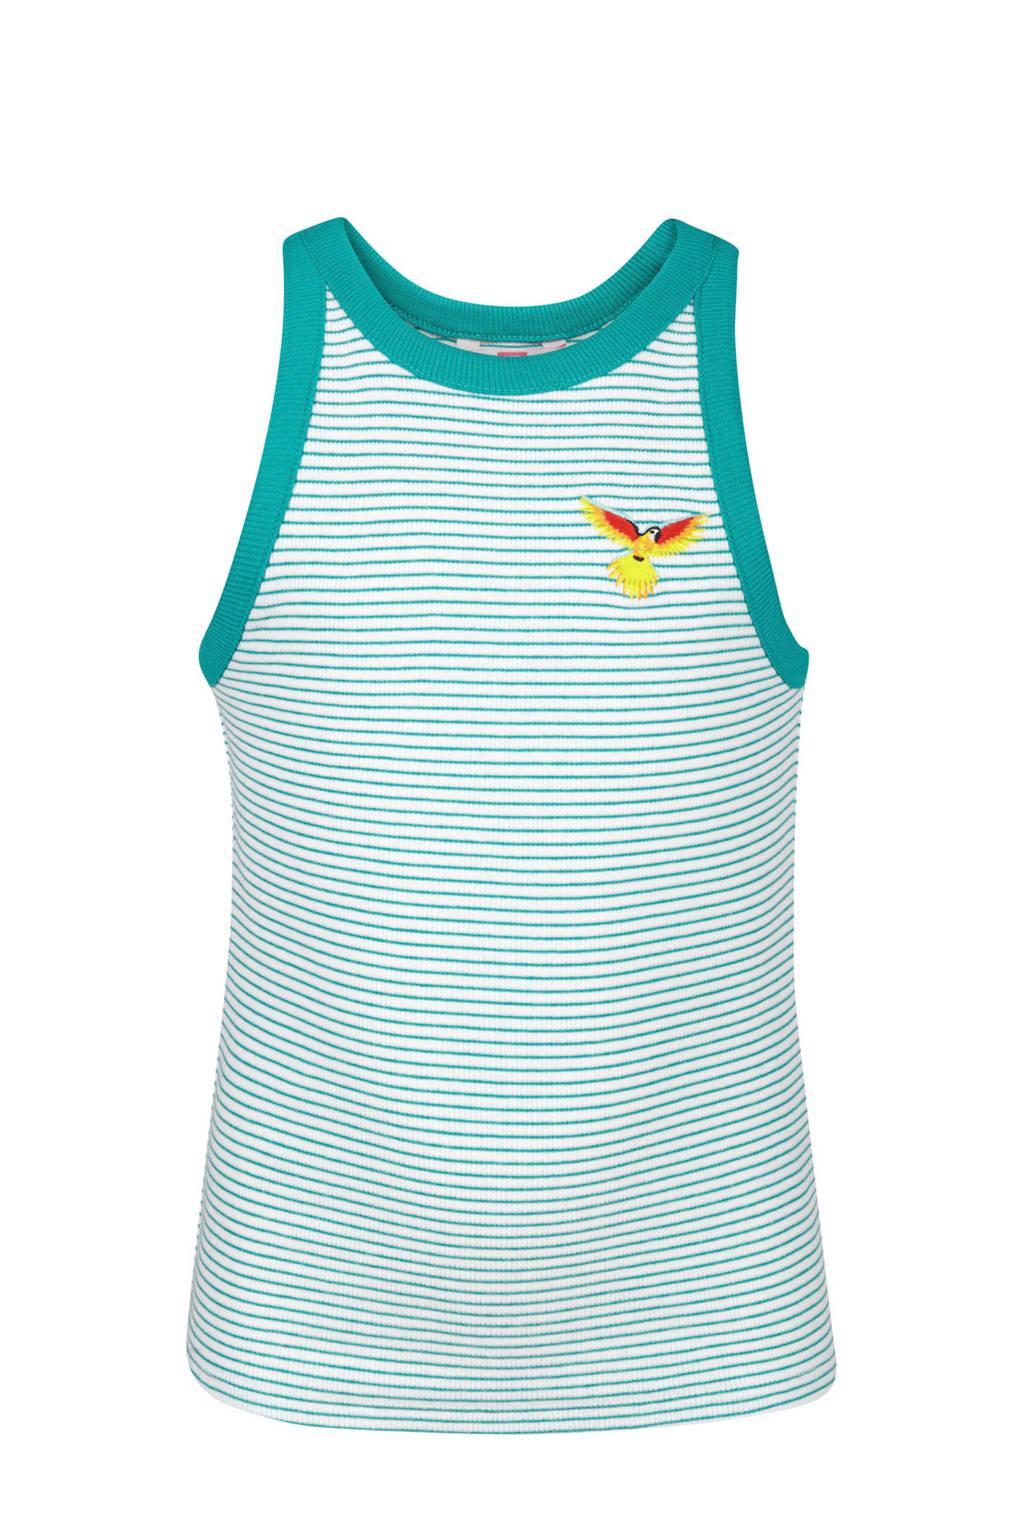 WE Fashion gestreepte top met vogel turquoise, Turquoise/wit